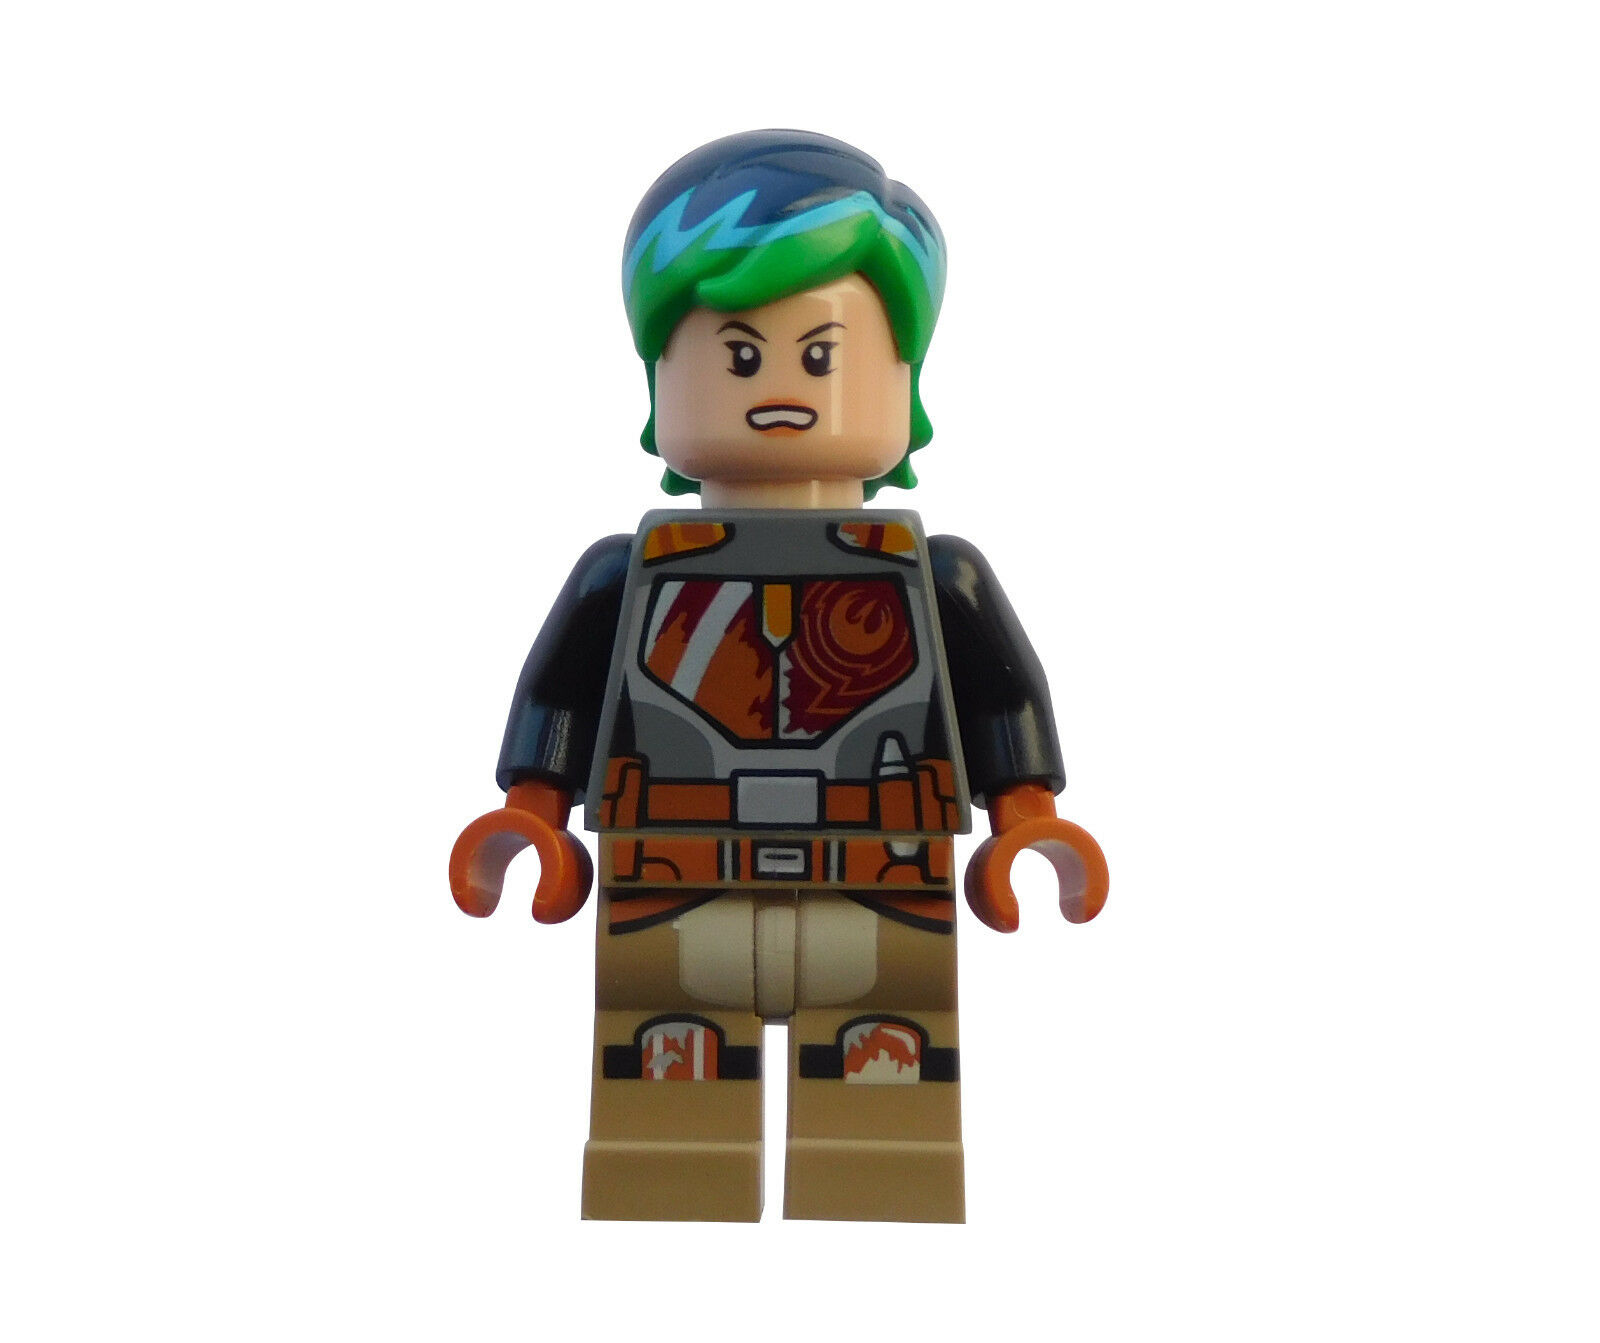 RARE LEGO BOUNTY HUNTER SABINE WREN MINIFIGURE 75106 STAR WARS REBELS